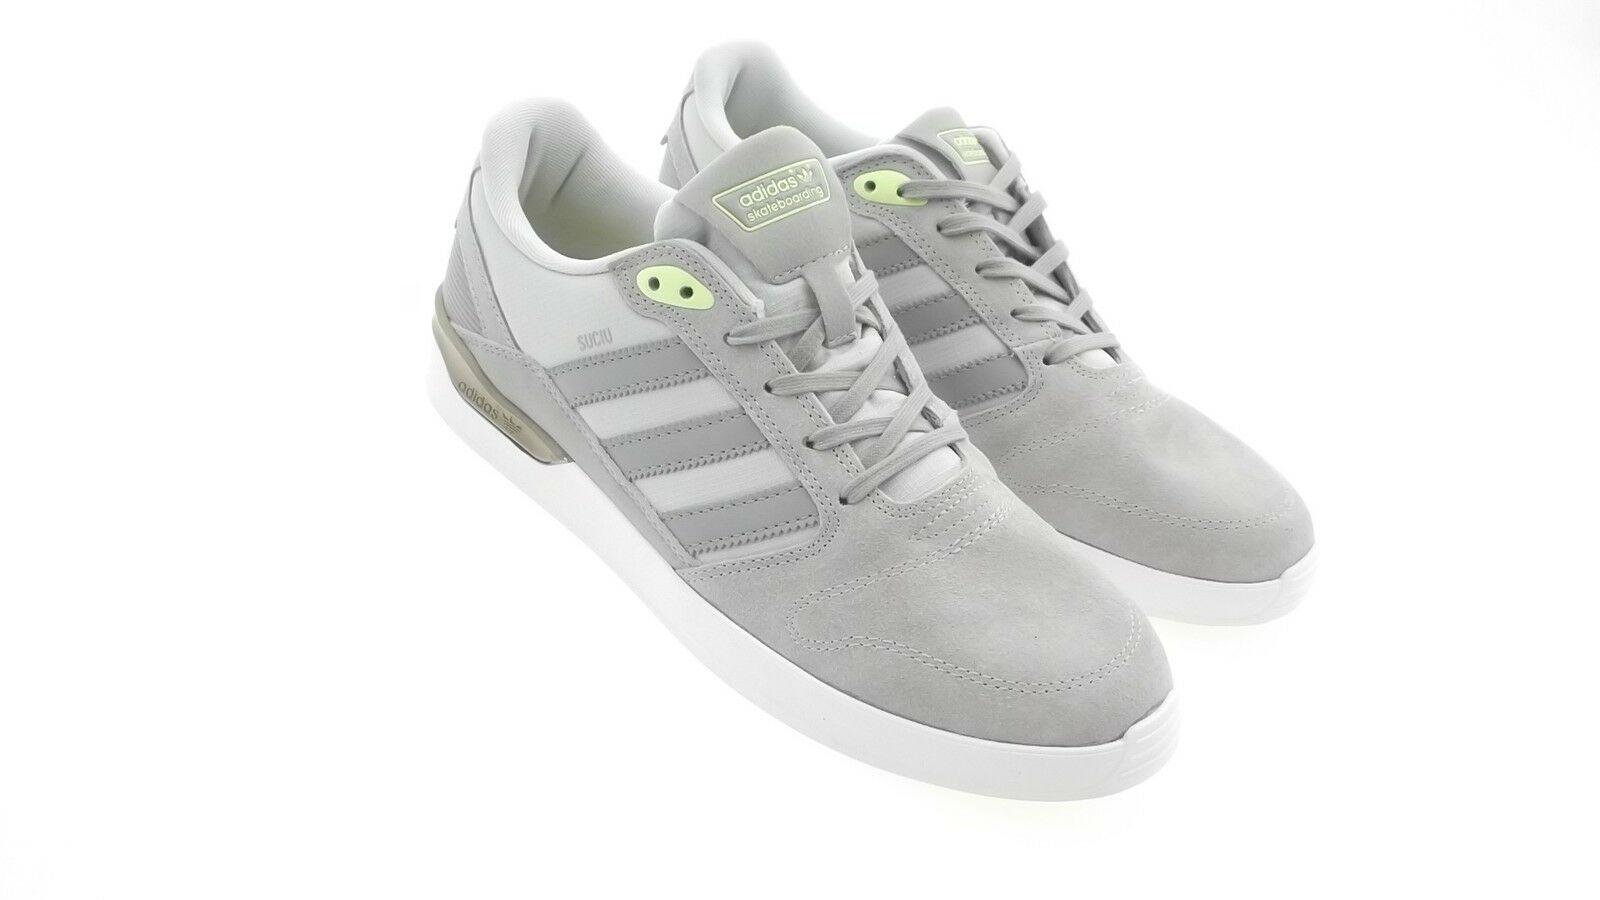 Adidas skate männer zx vulc c77725 gray mgsogry onix c77725 vulc ad3eef